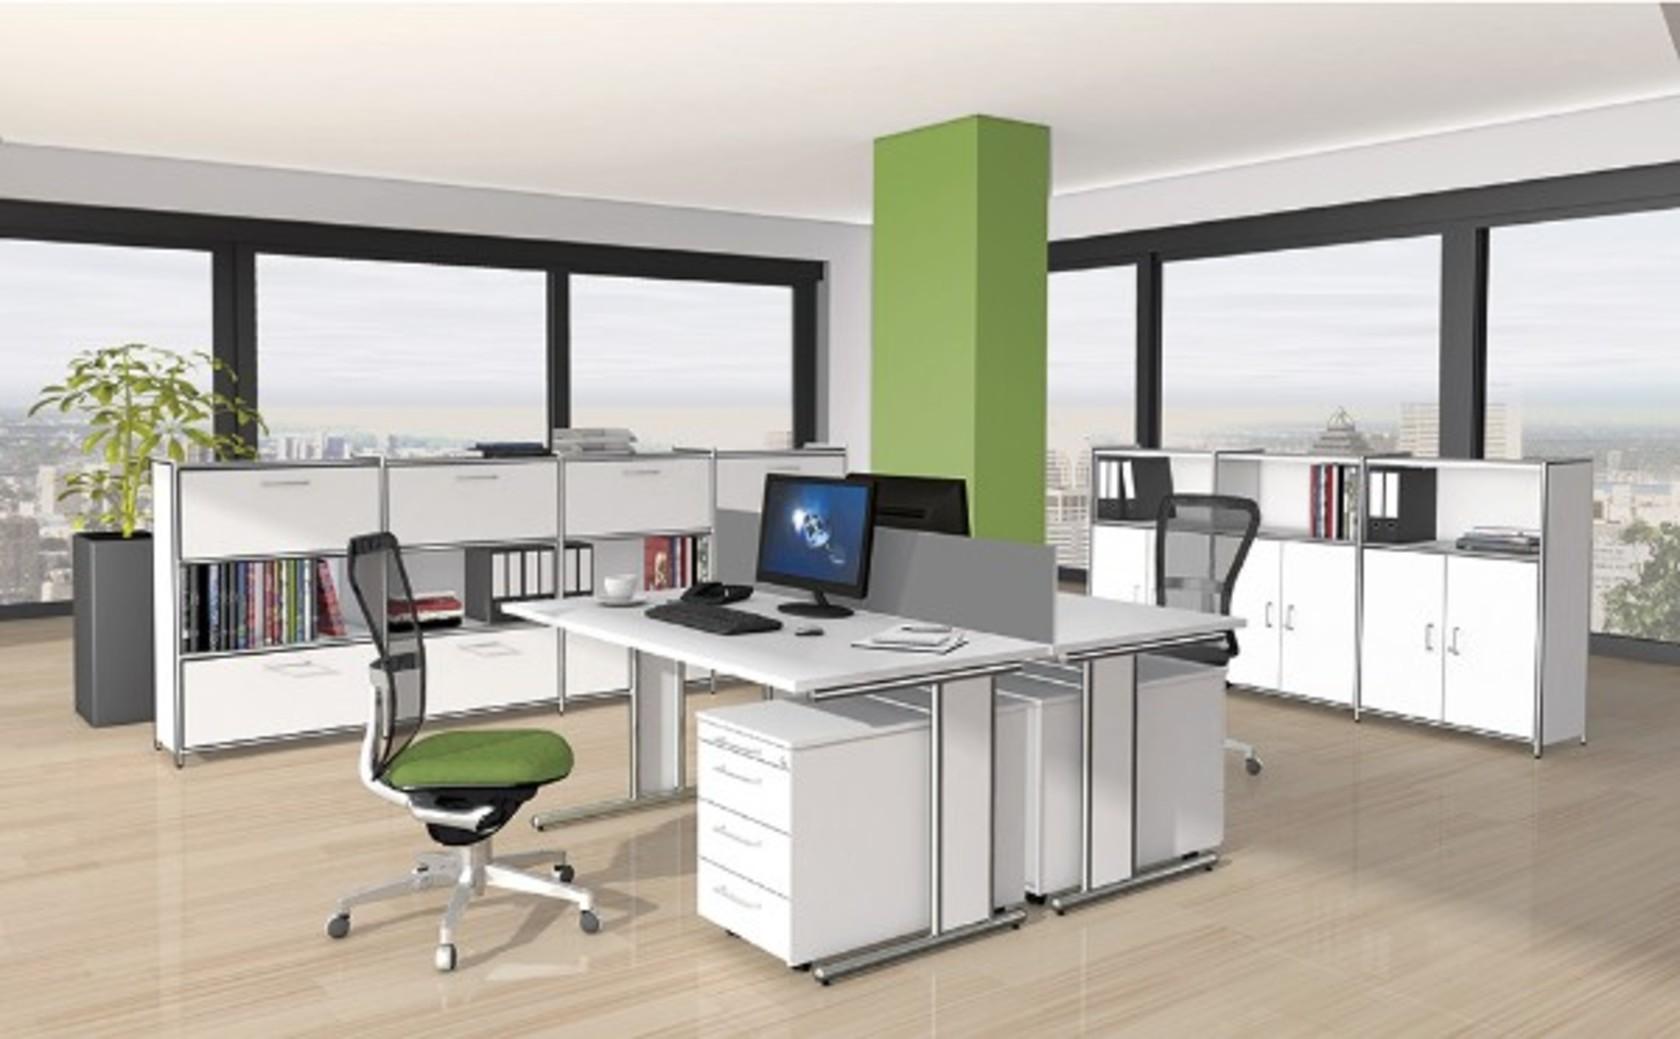 Leihmöbel - Kranich Büromöbel Vertriebs GmbH